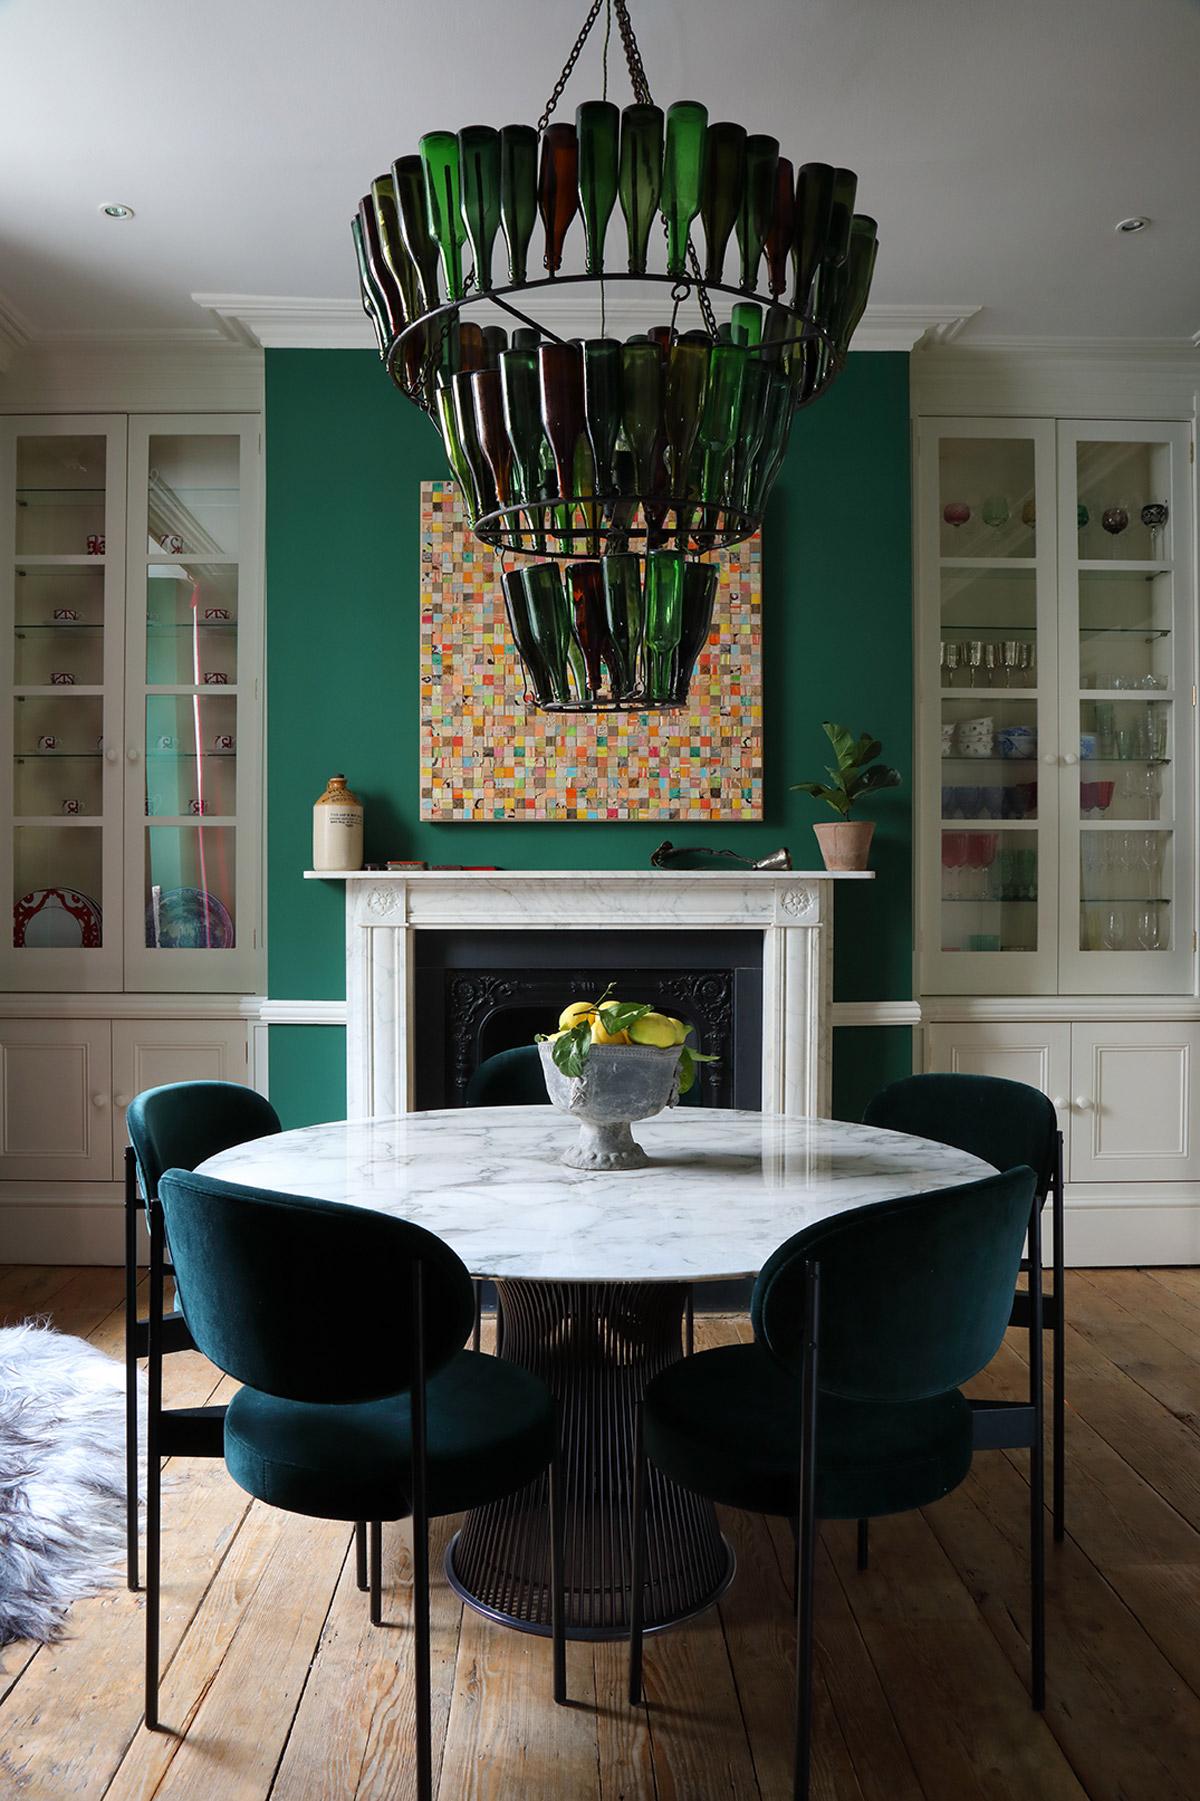 Interior designer, Ana Engelhorn project image of dining room interior with fireplace